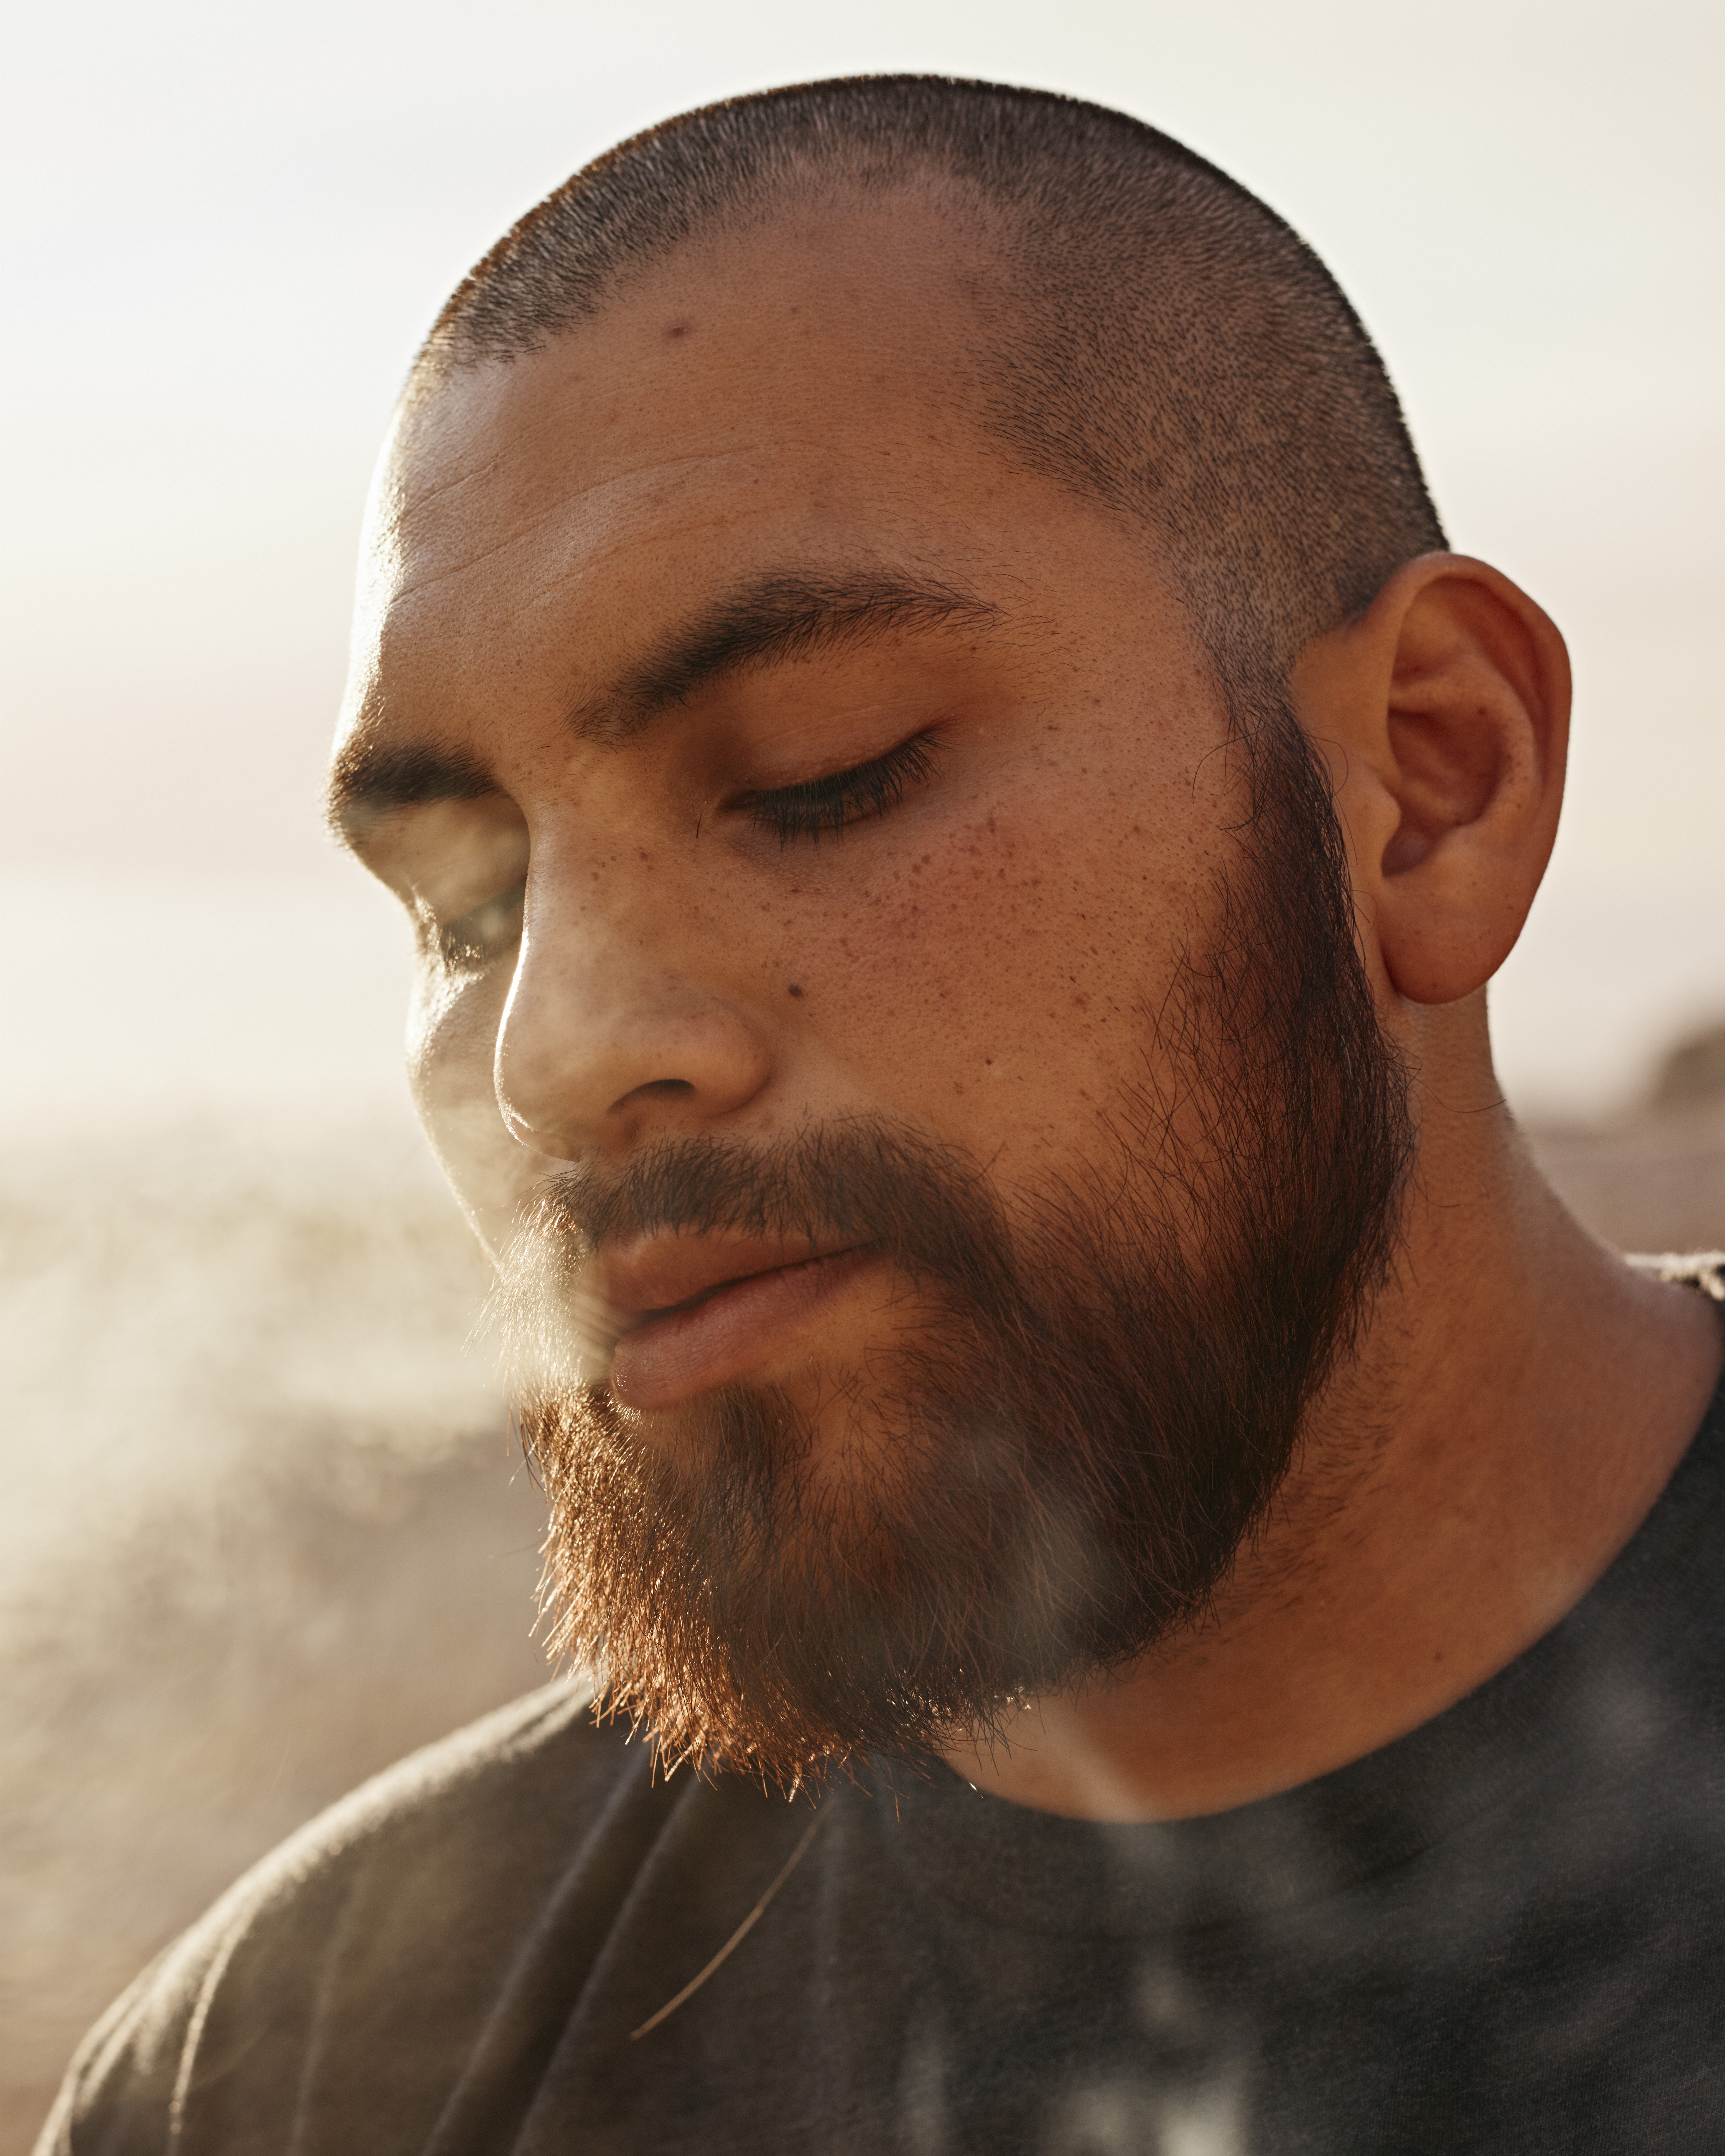 Martinez smokes medical marijuana near his home in Apple Valley, California, June 17, 2016.